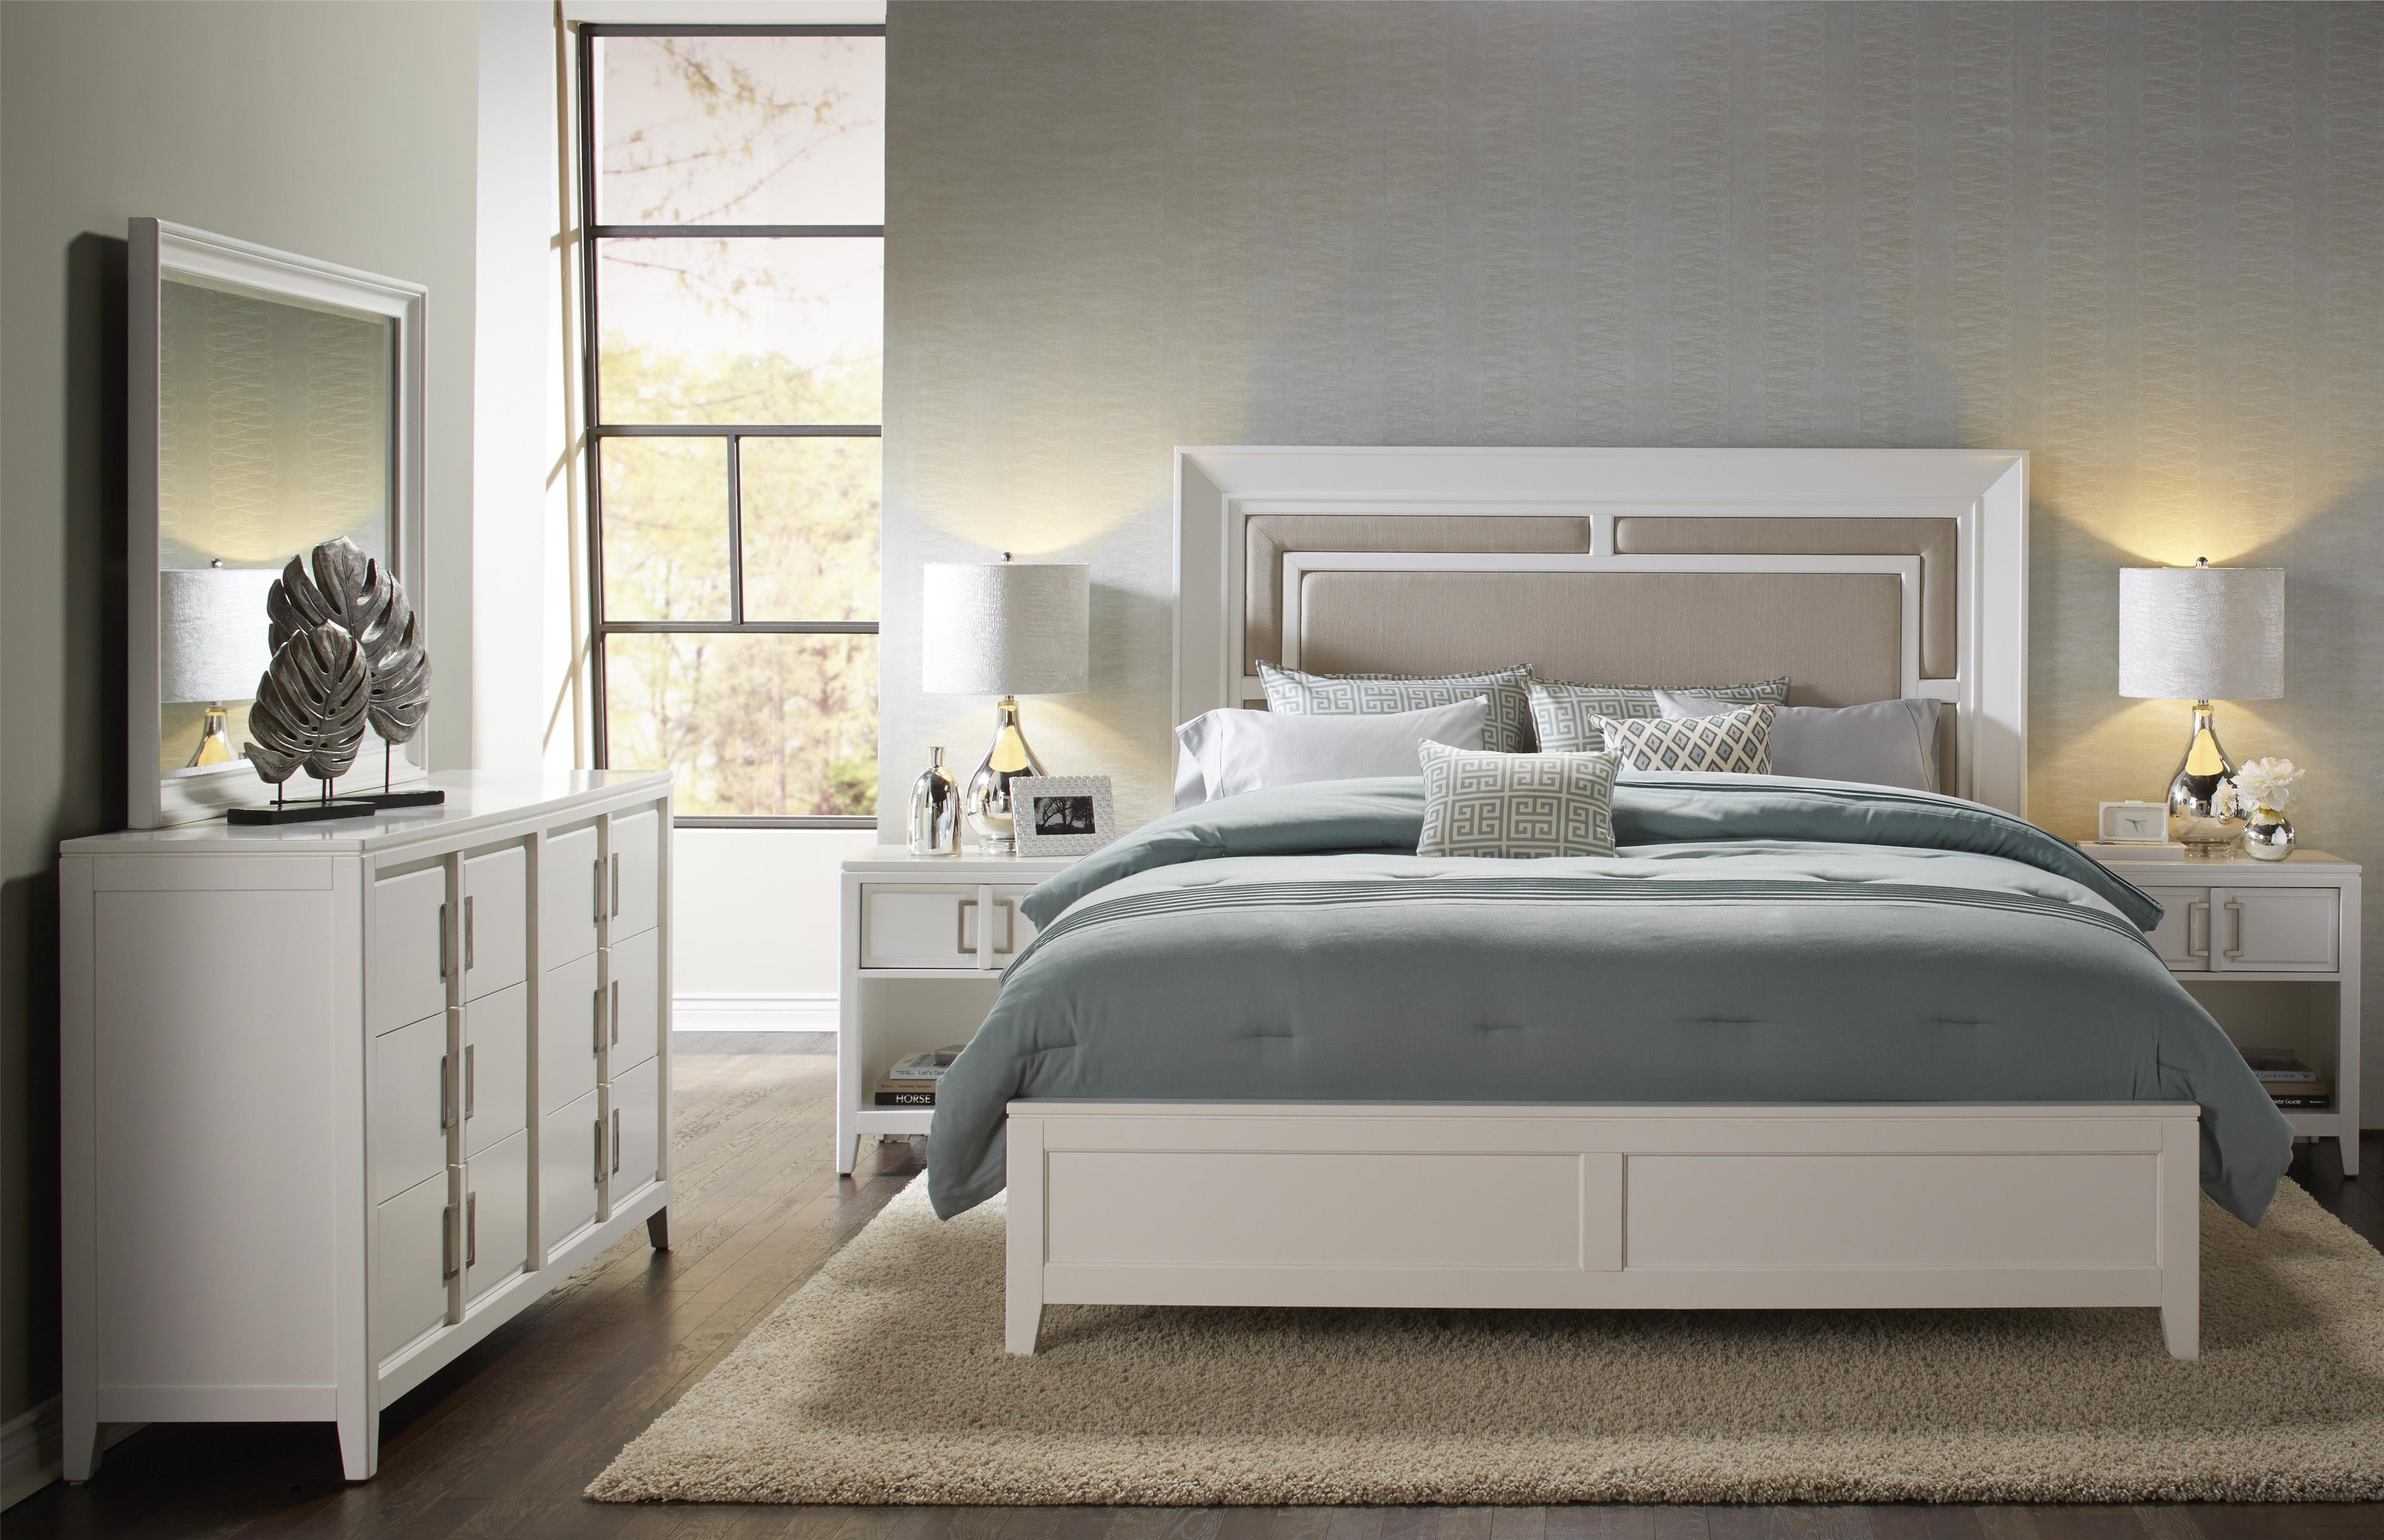 Samuel Lawrence Brighton Cal King Bedroom Group - Item Number: 8673 CK Bedroom Group 1